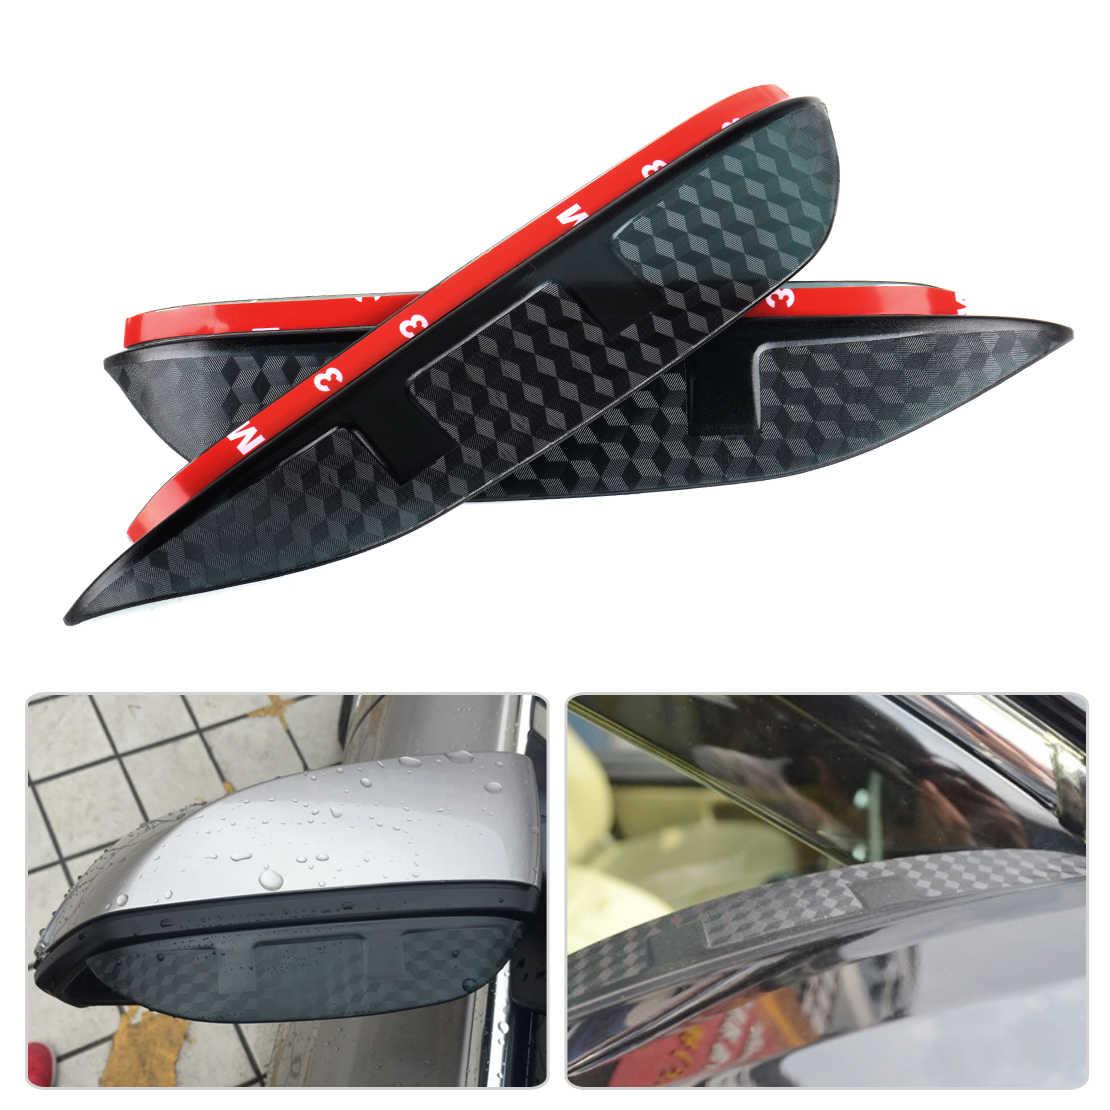 SNCN 2 adet Dikiz Yağmur Kaş Koruyucu Kapak Yan Kapı Ayna Visor Kalkanı Audi için Fit A1 A3 A4 b7 b8 b9 A5 A6 Q3 Q5 Q7